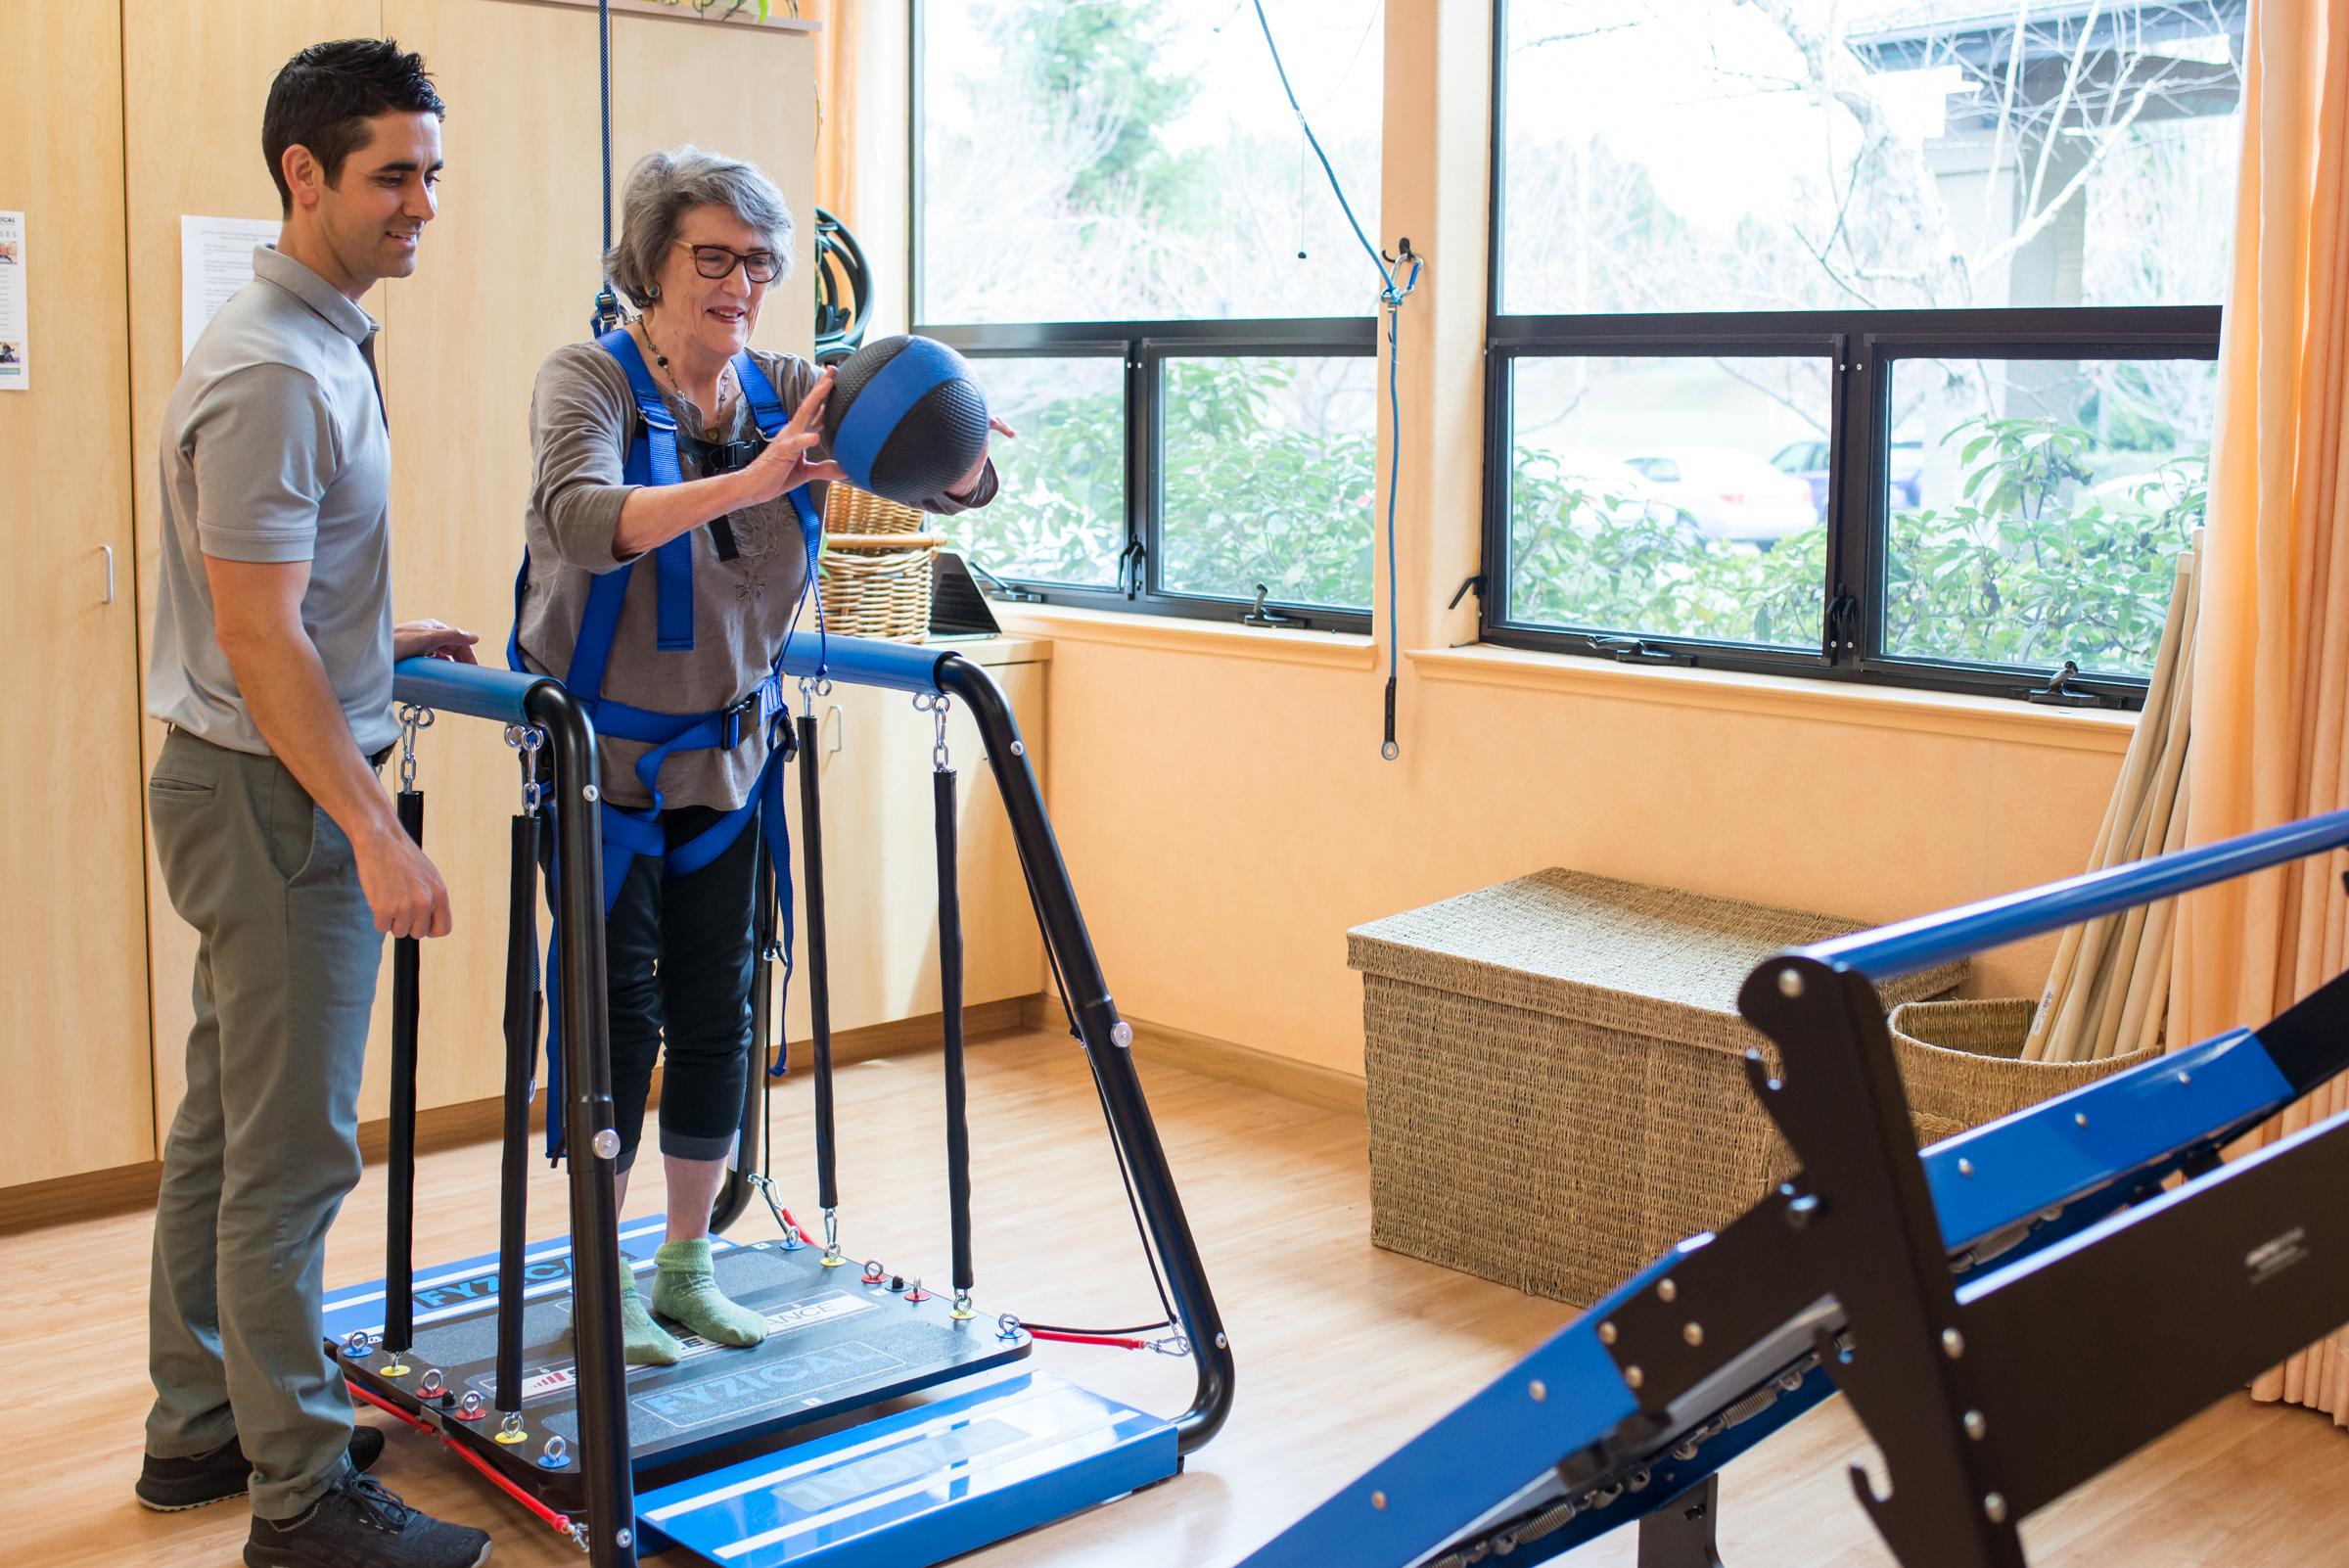 FYZICAL Balance Center   Fall Prevention | Dizziness Management | Vestibular Rehabilitation   LEARN MORE